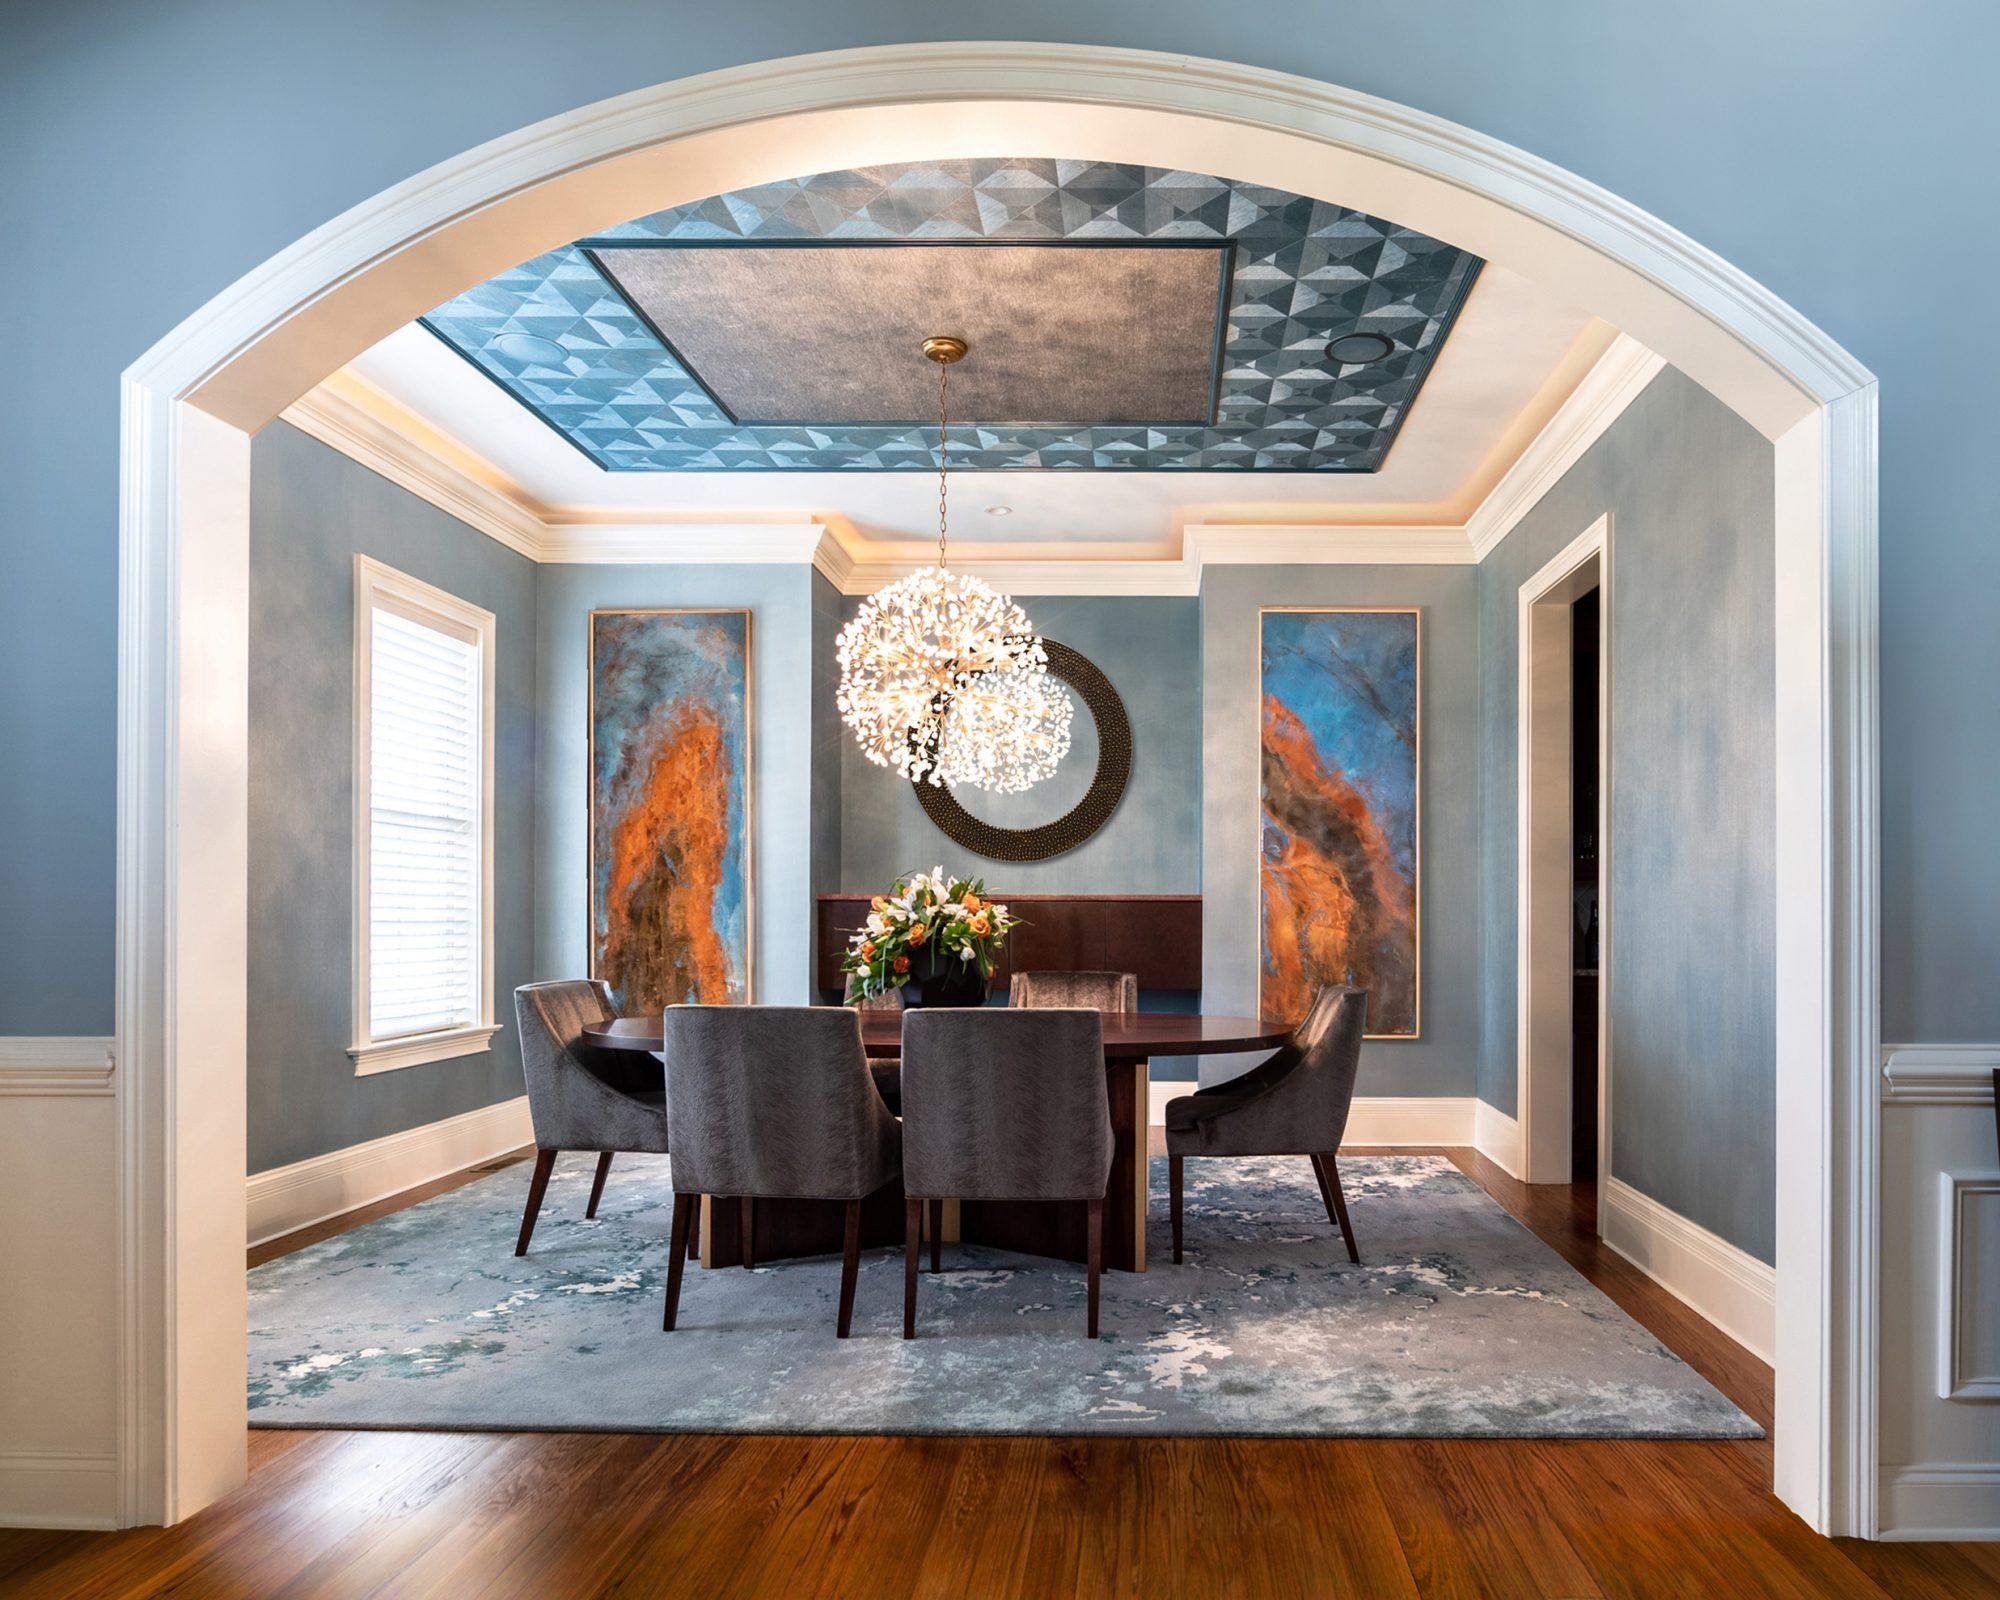 Kitchen Dinning Room Design Remodeling In Philadelphia